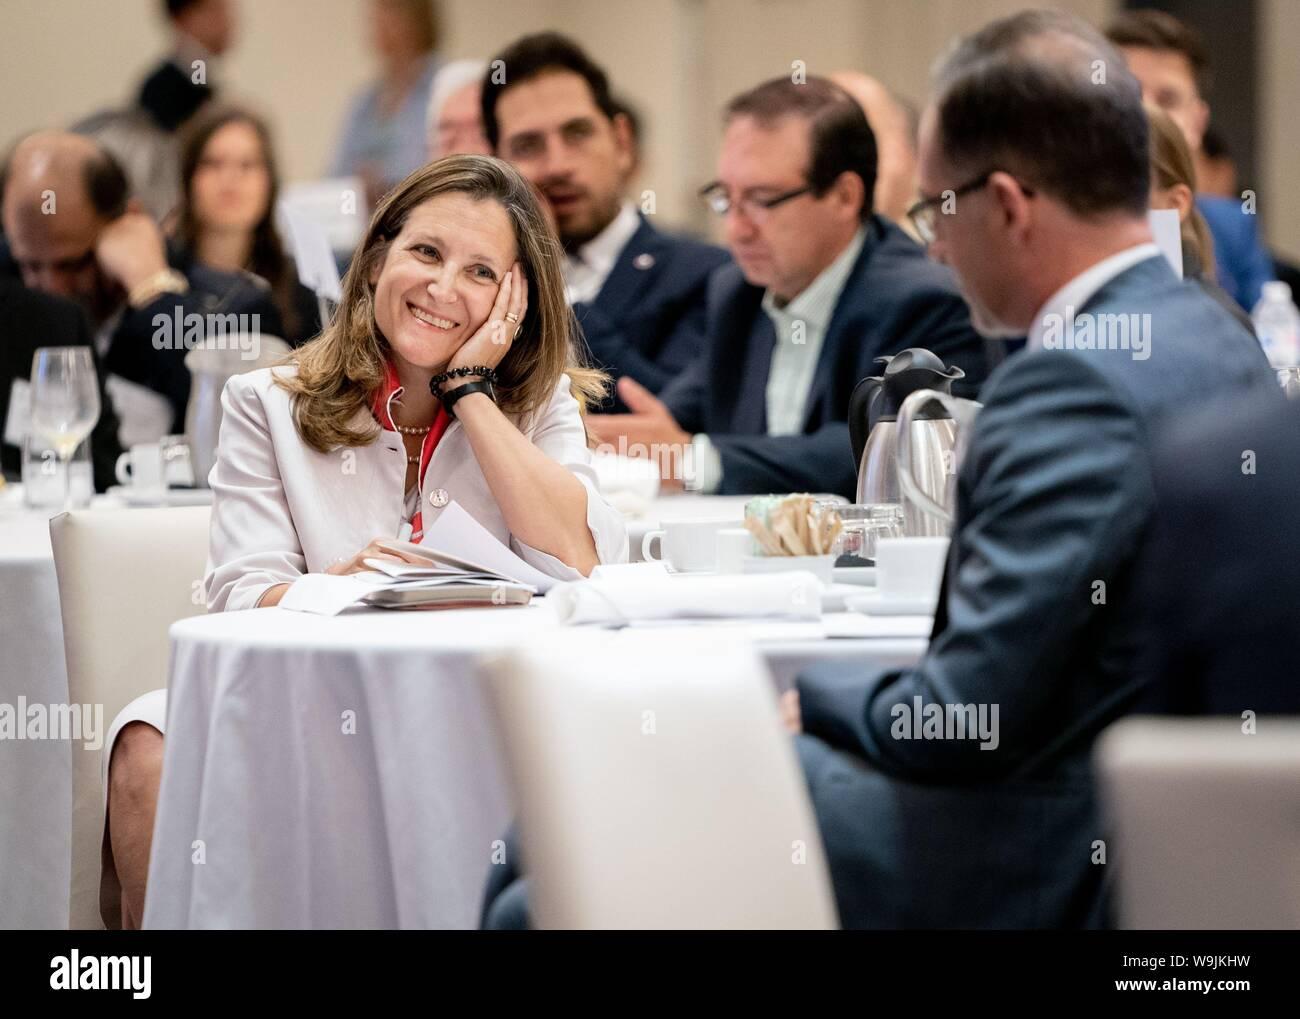 Toronto, Canada  14th Aug, 2019  Heiko Maas (r, SPD